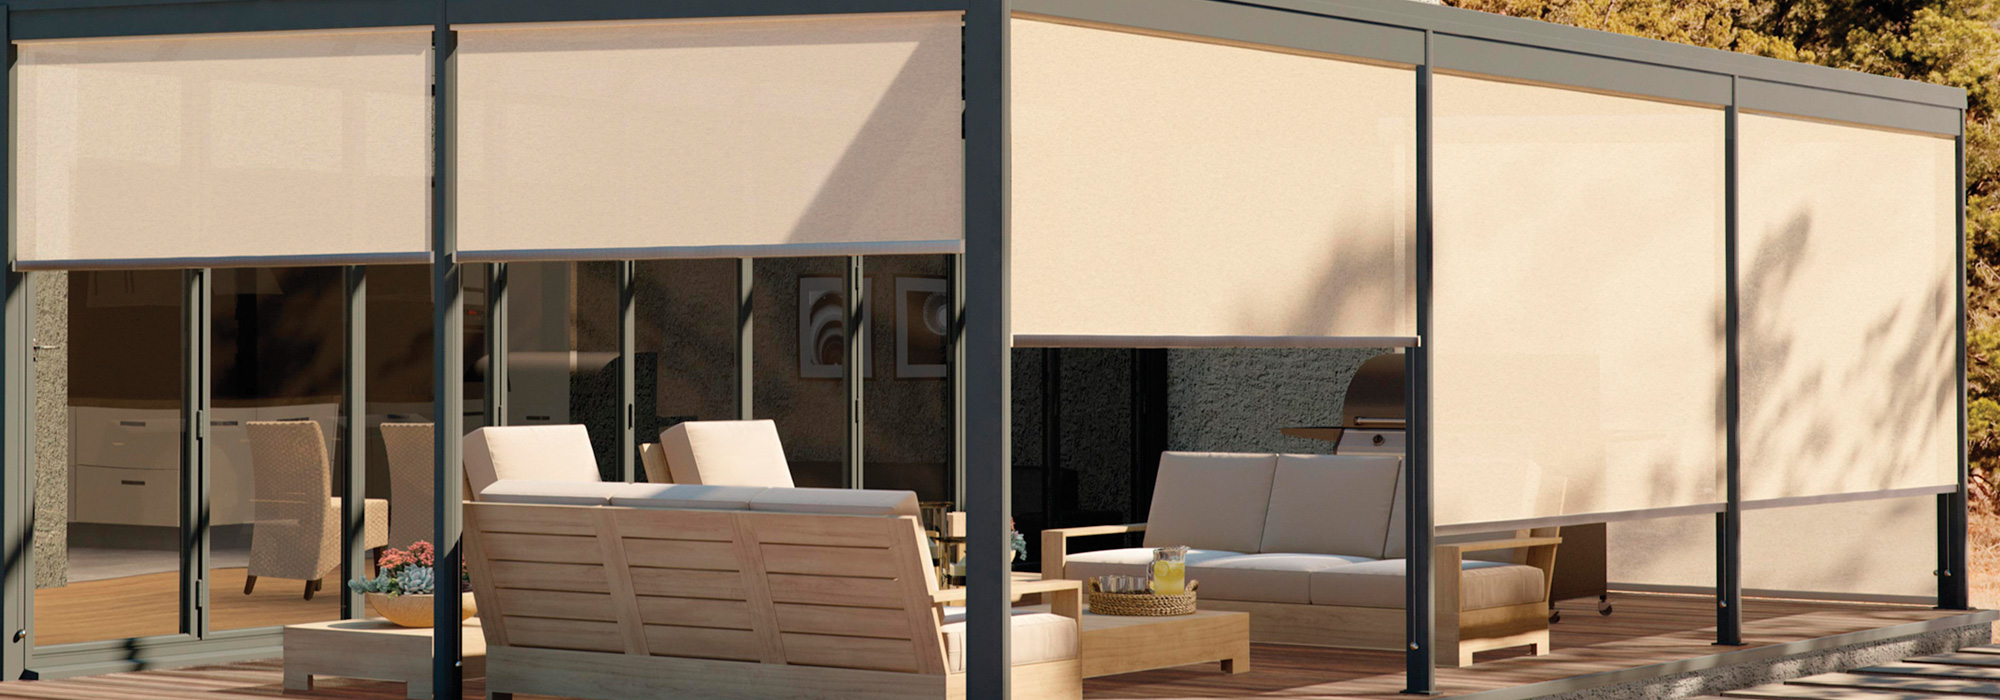 effect or blinds main blog roller sunscreen otrt reduce glare office home blocking interiors sun